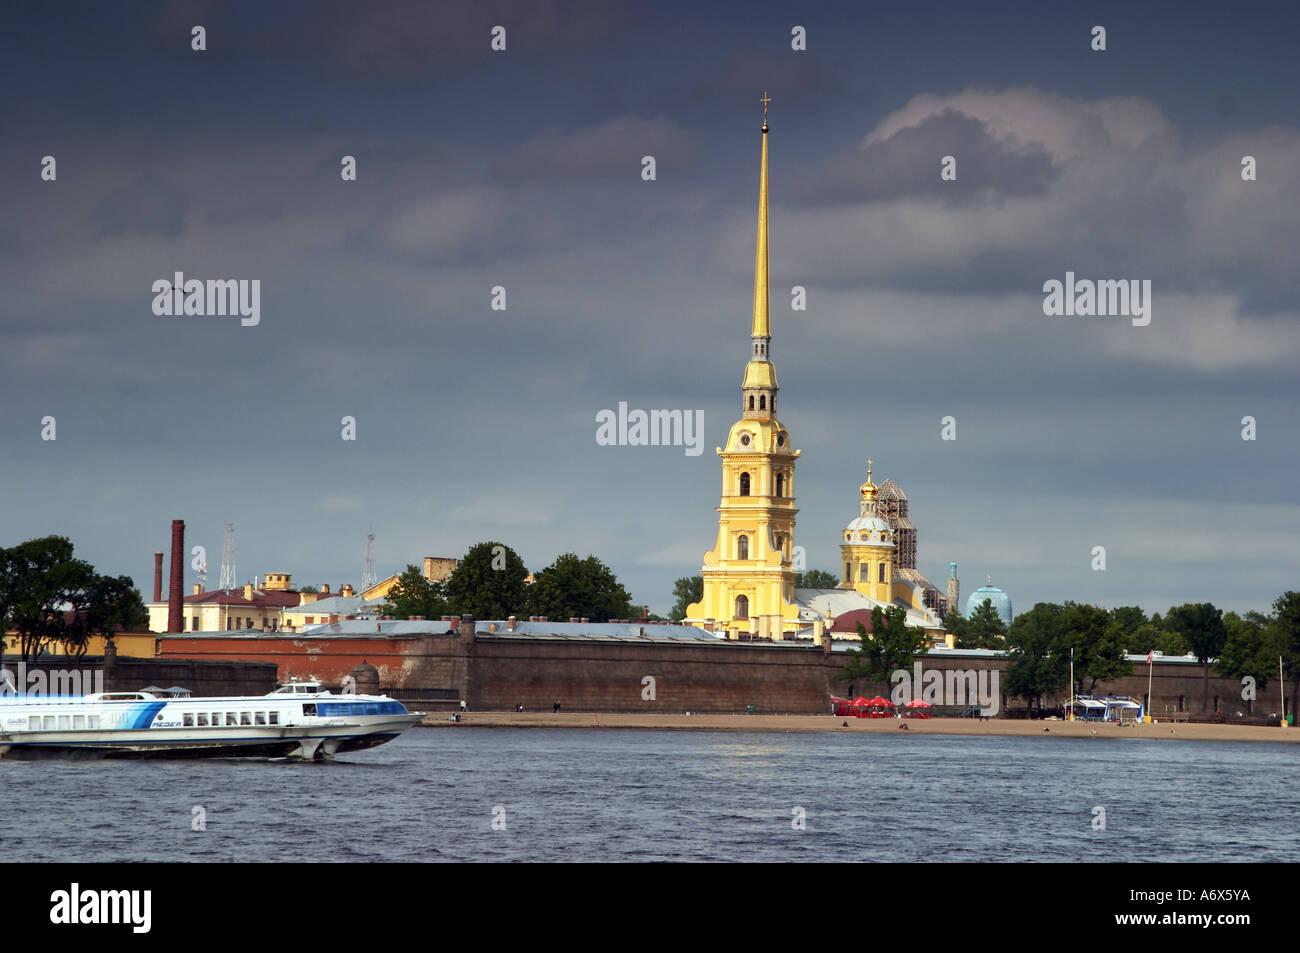 St Petersburg Neva river with spead boat Petropavlovskaya krepost Stock Photo